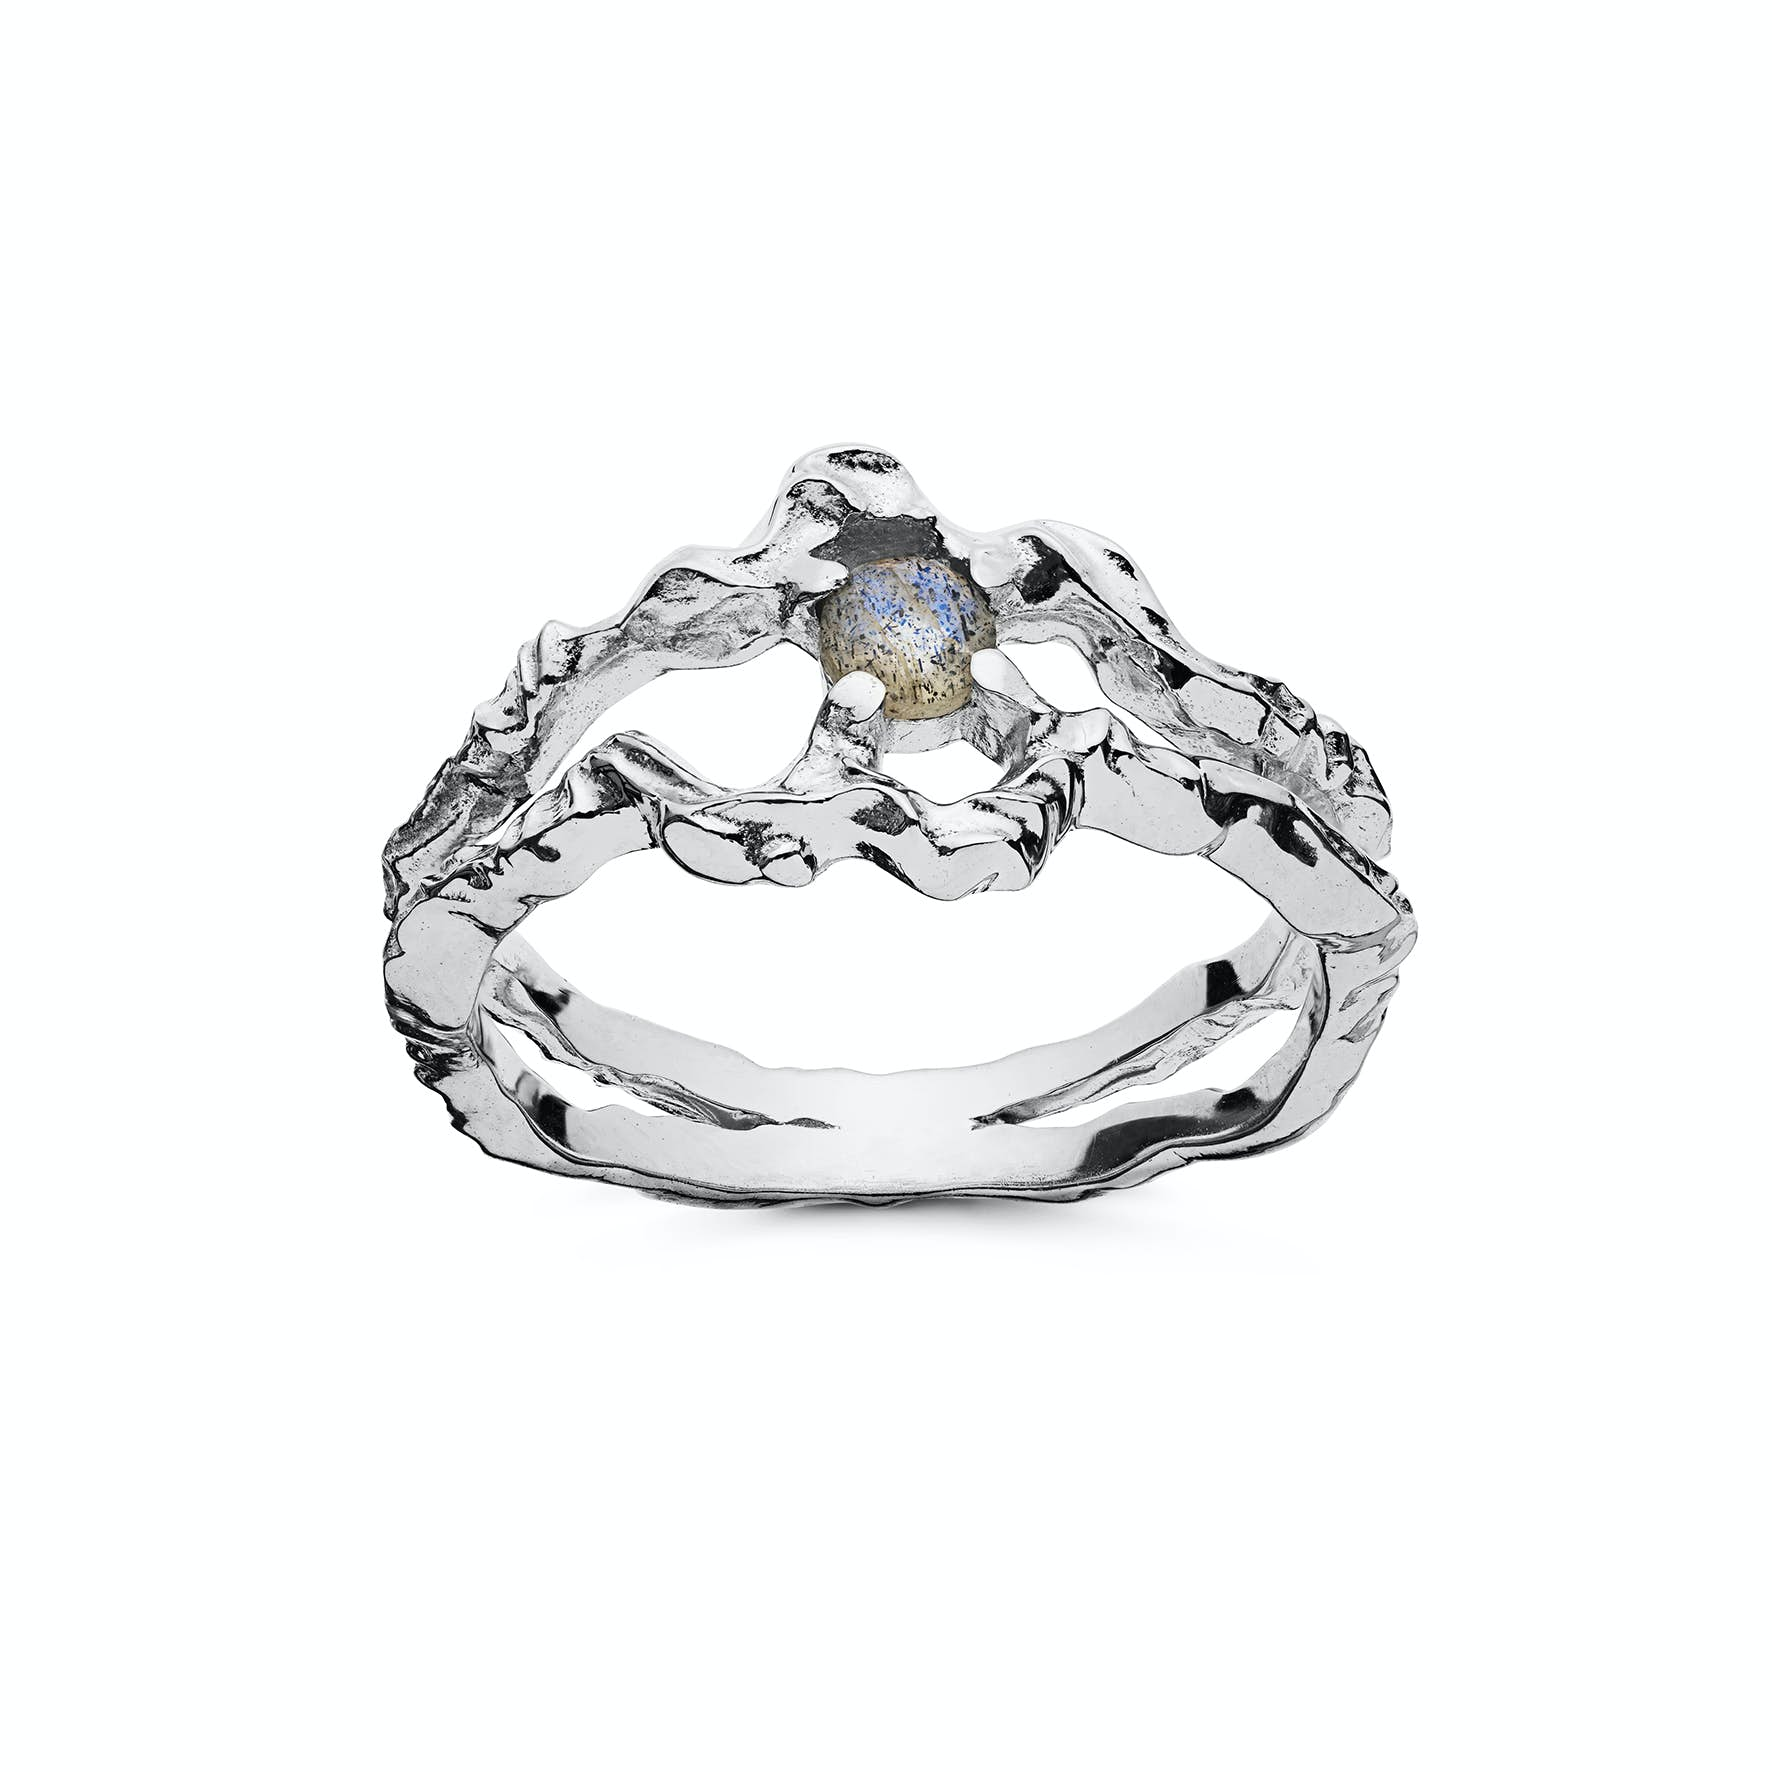 Shelly Ring von Maanesten in Silber Sterling 925